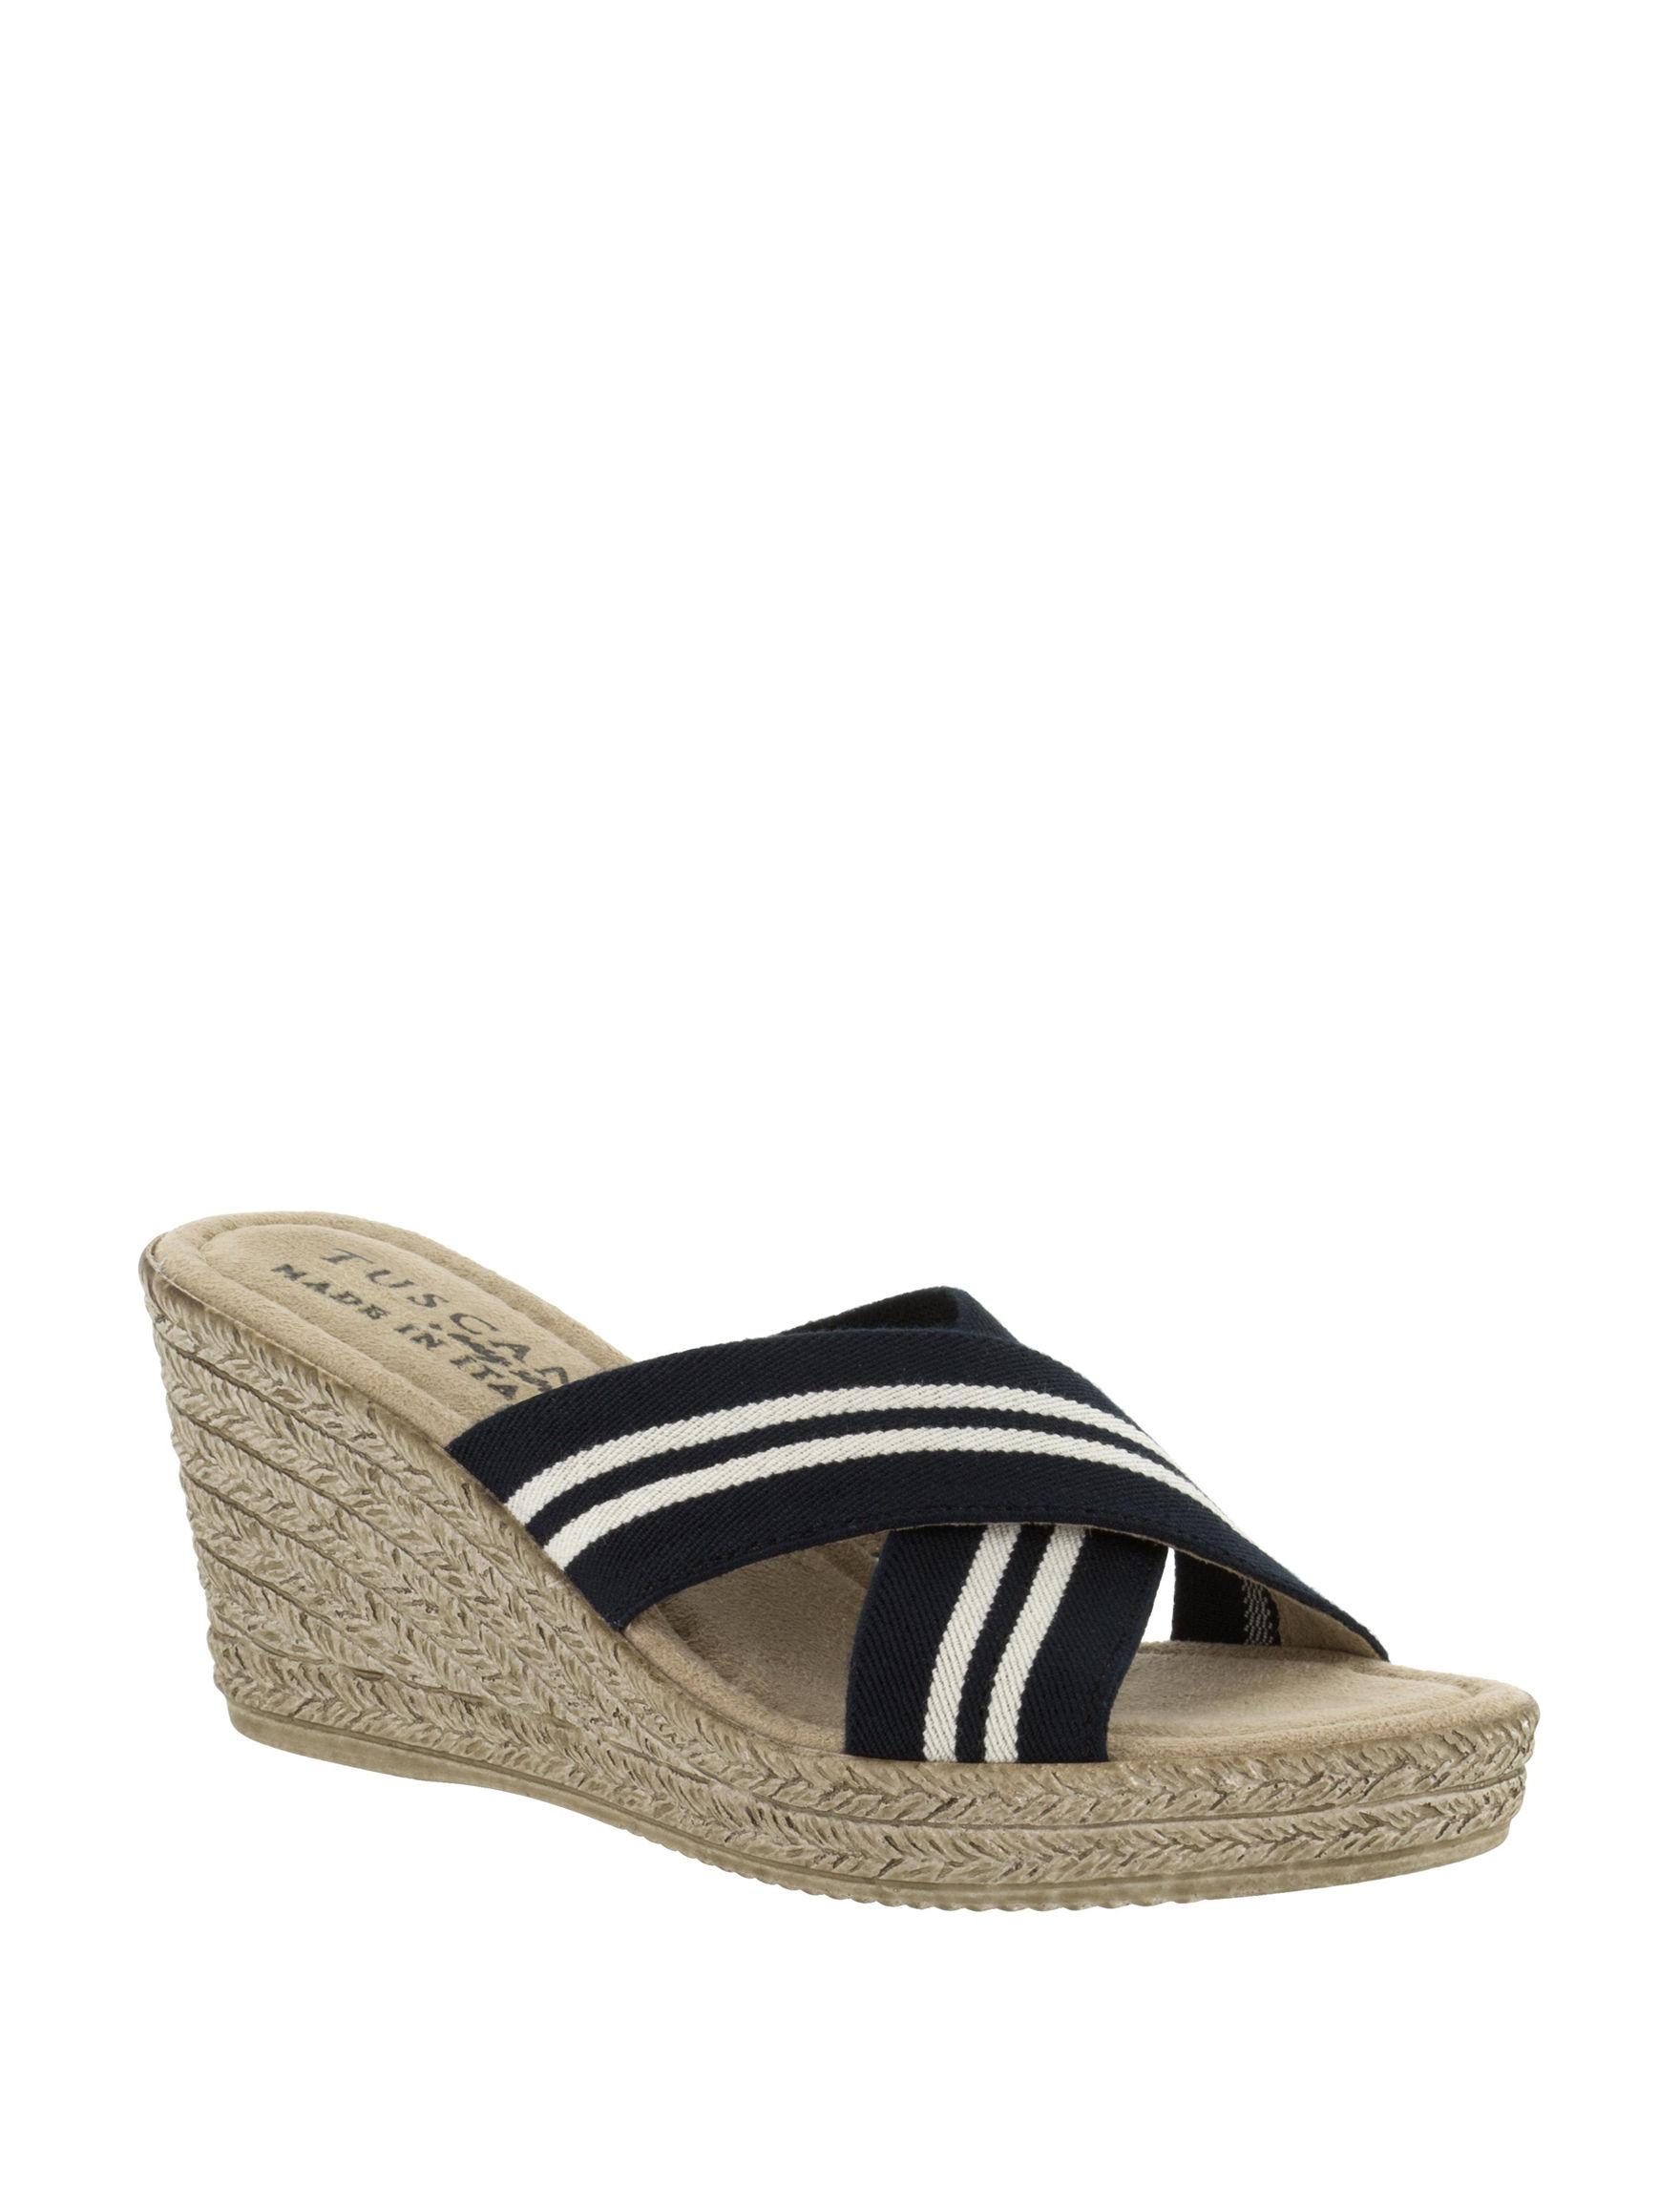 Easy Street Grey Wedge Sandals